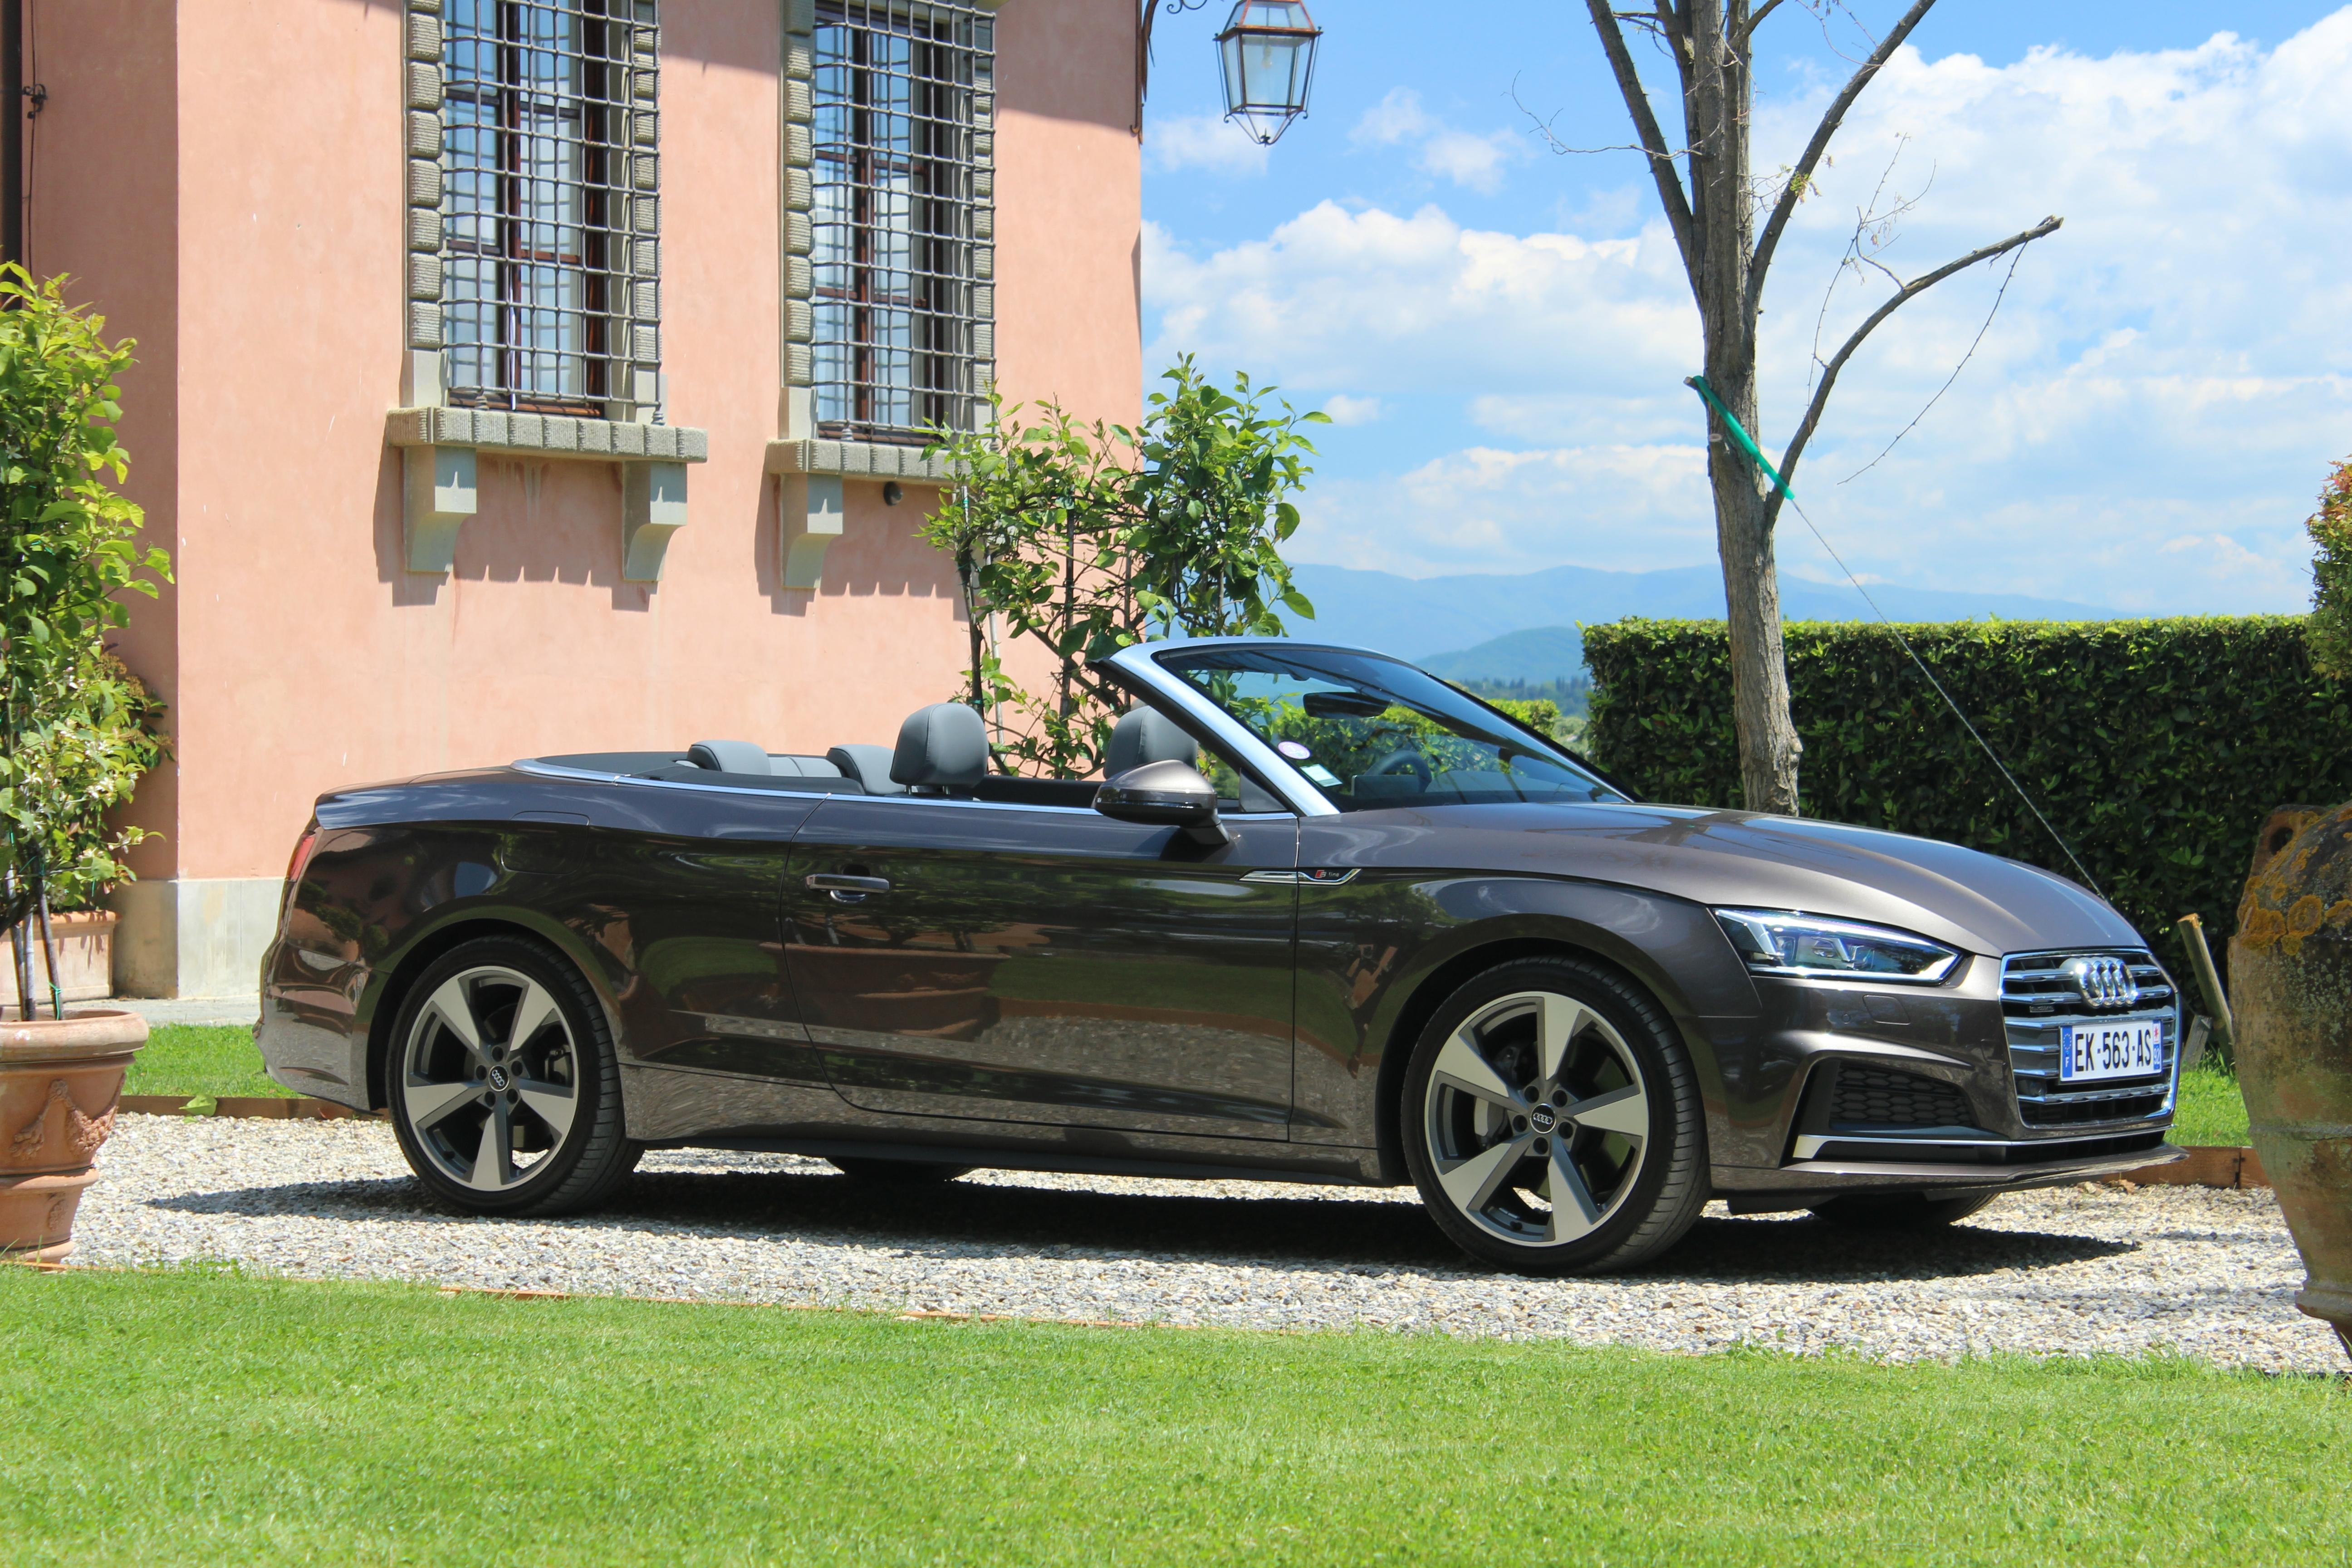 cabriolet 30 000 euros